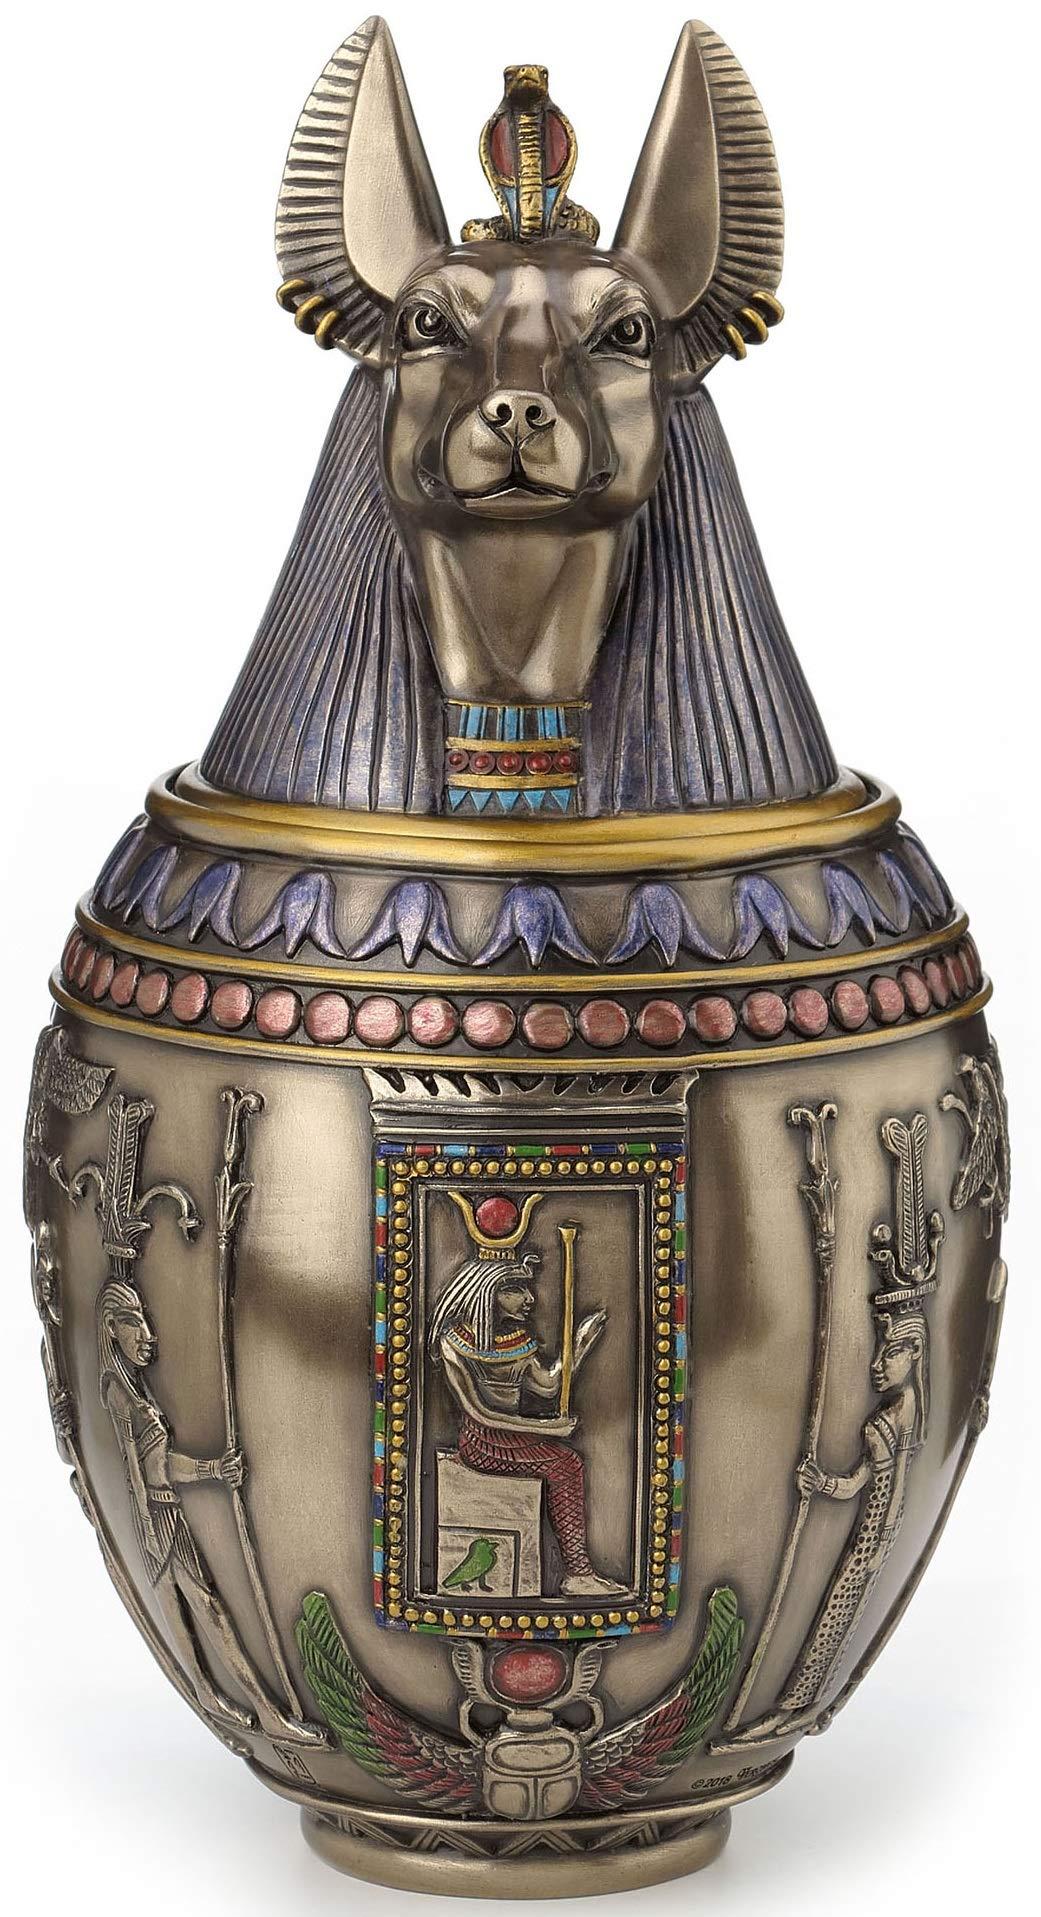 Rare Egyptian Anubis Dog Memorial Urn Canopic Jar by JFSM INC